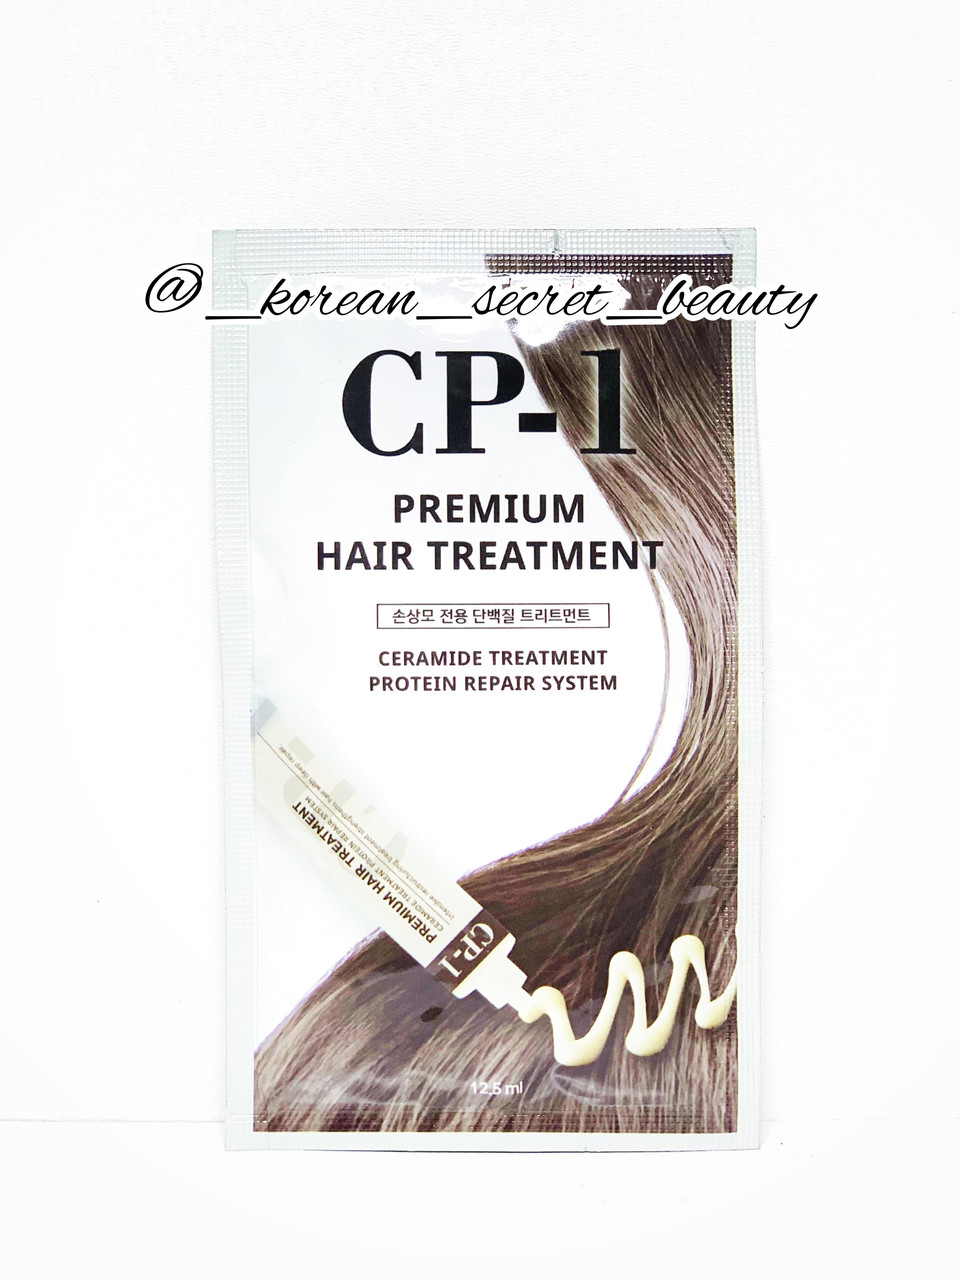 Протеїнова маска для волосся CP-1 Premium Hair Treatment Pouch 12,5 мл